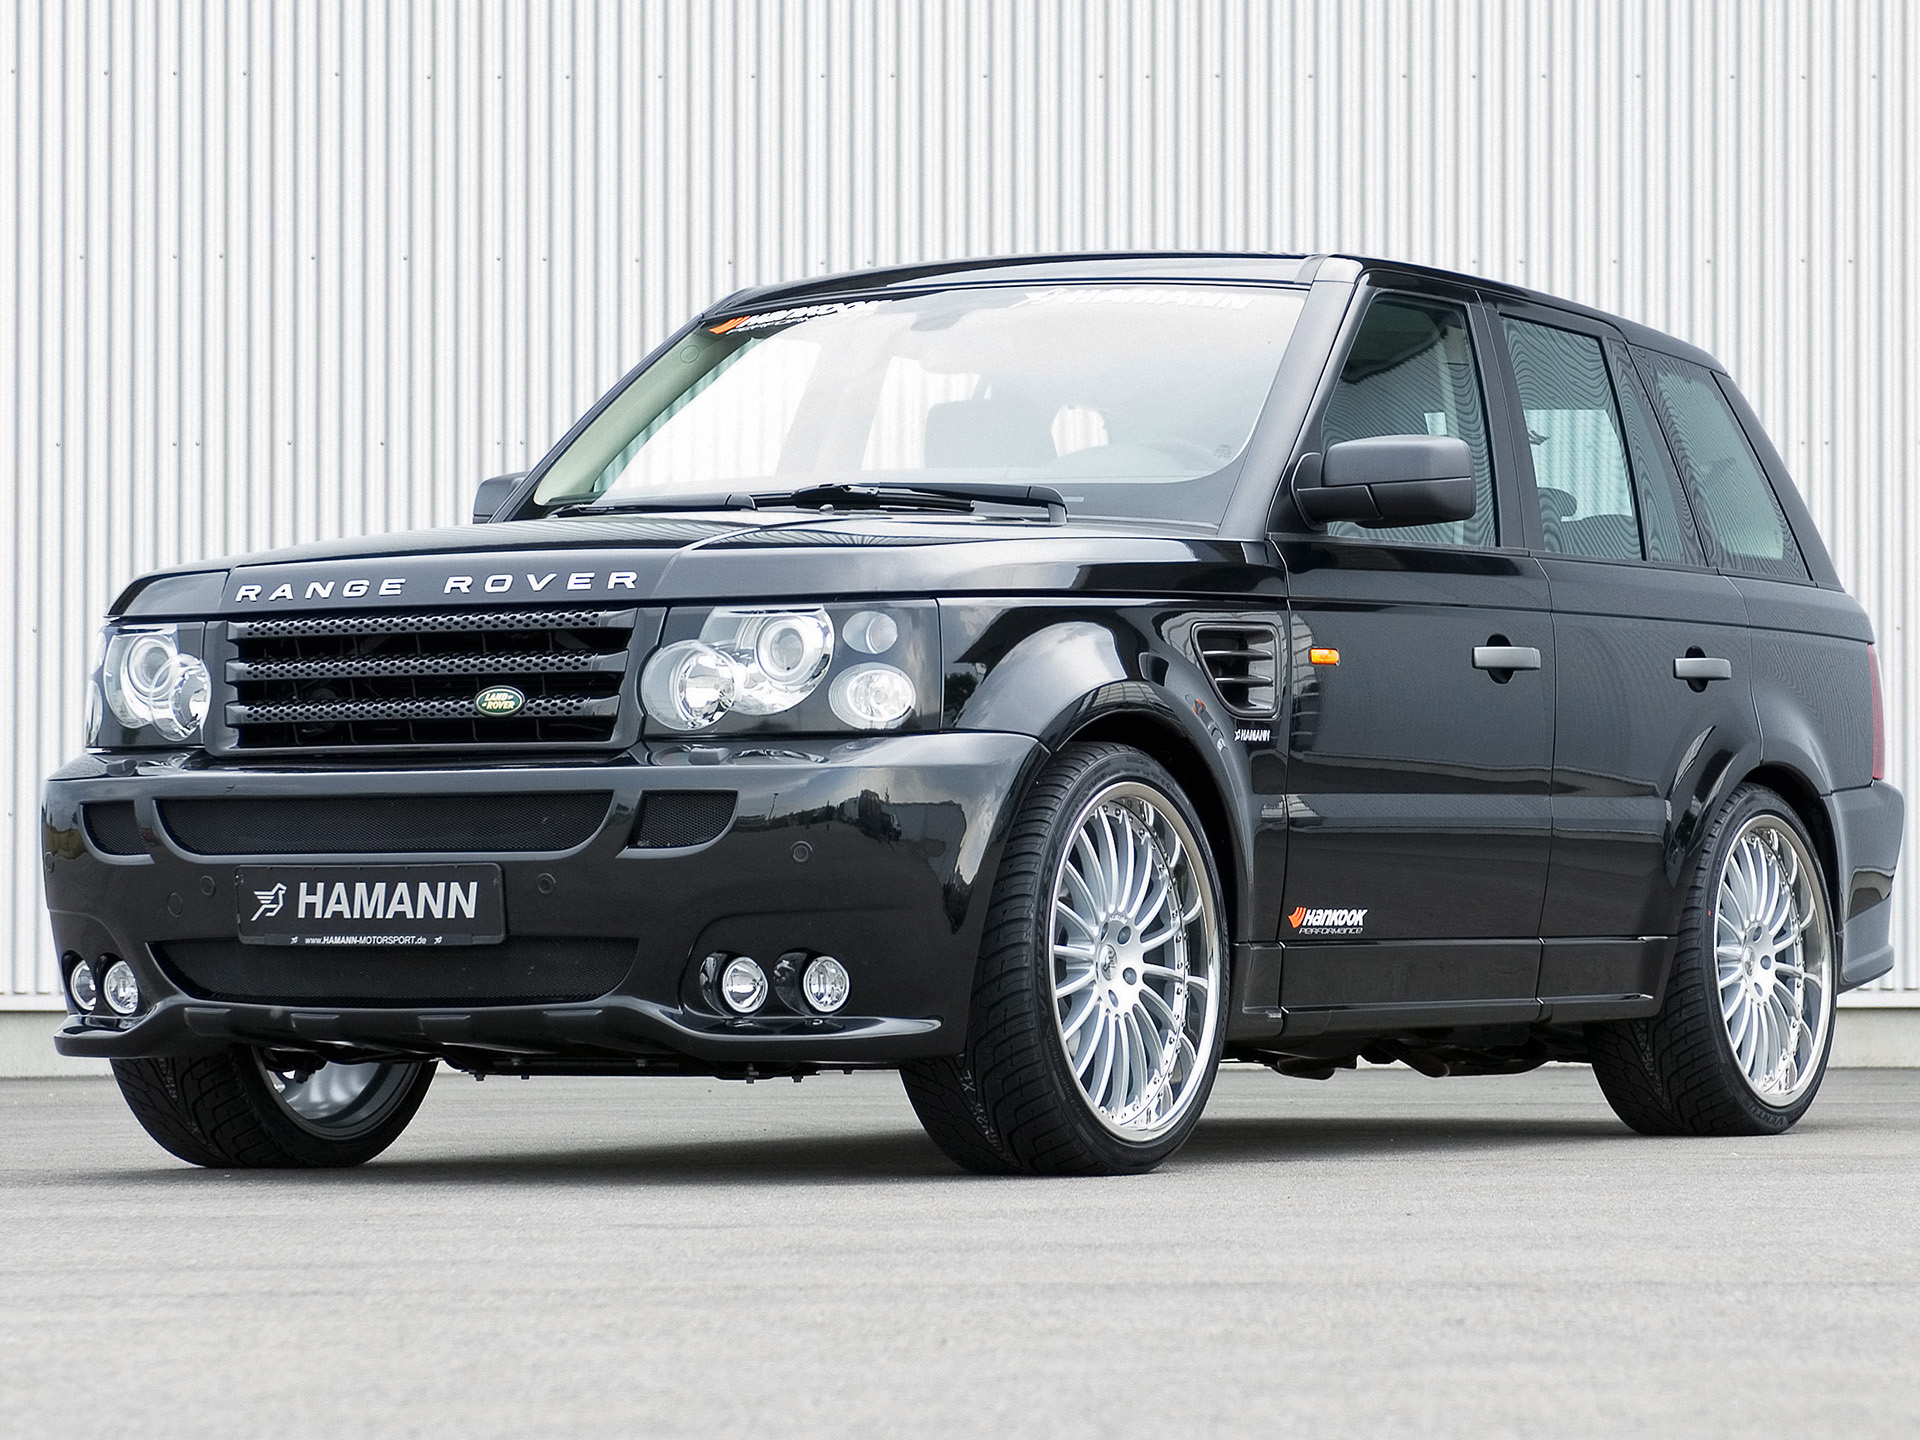 Hamann Range Rover Sport photos - PhotoGallery with 7 pics ...